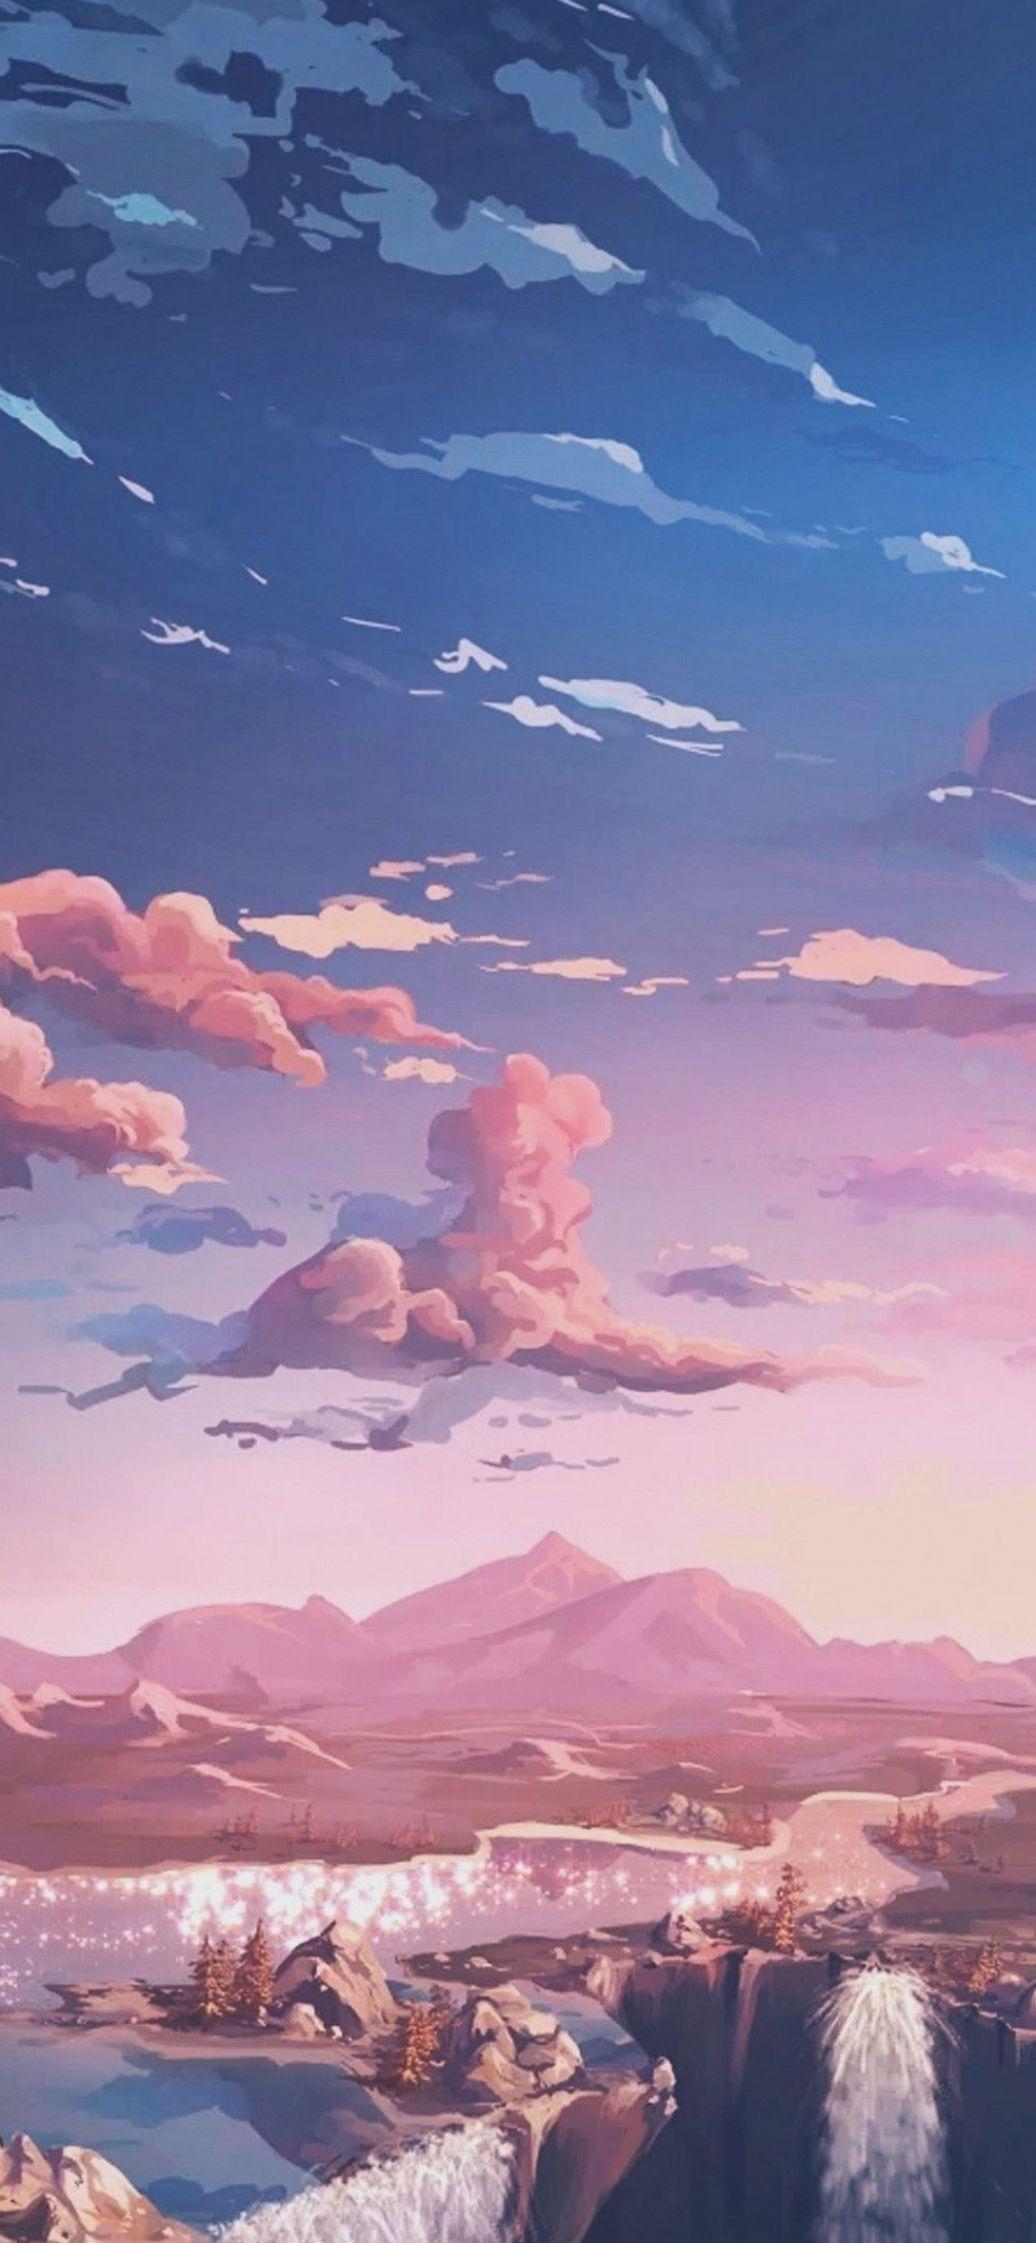 Hd Oboi Hd Wallpaper Scenery Wallpaper Anime Scenery Anime Scenery Wallpaper